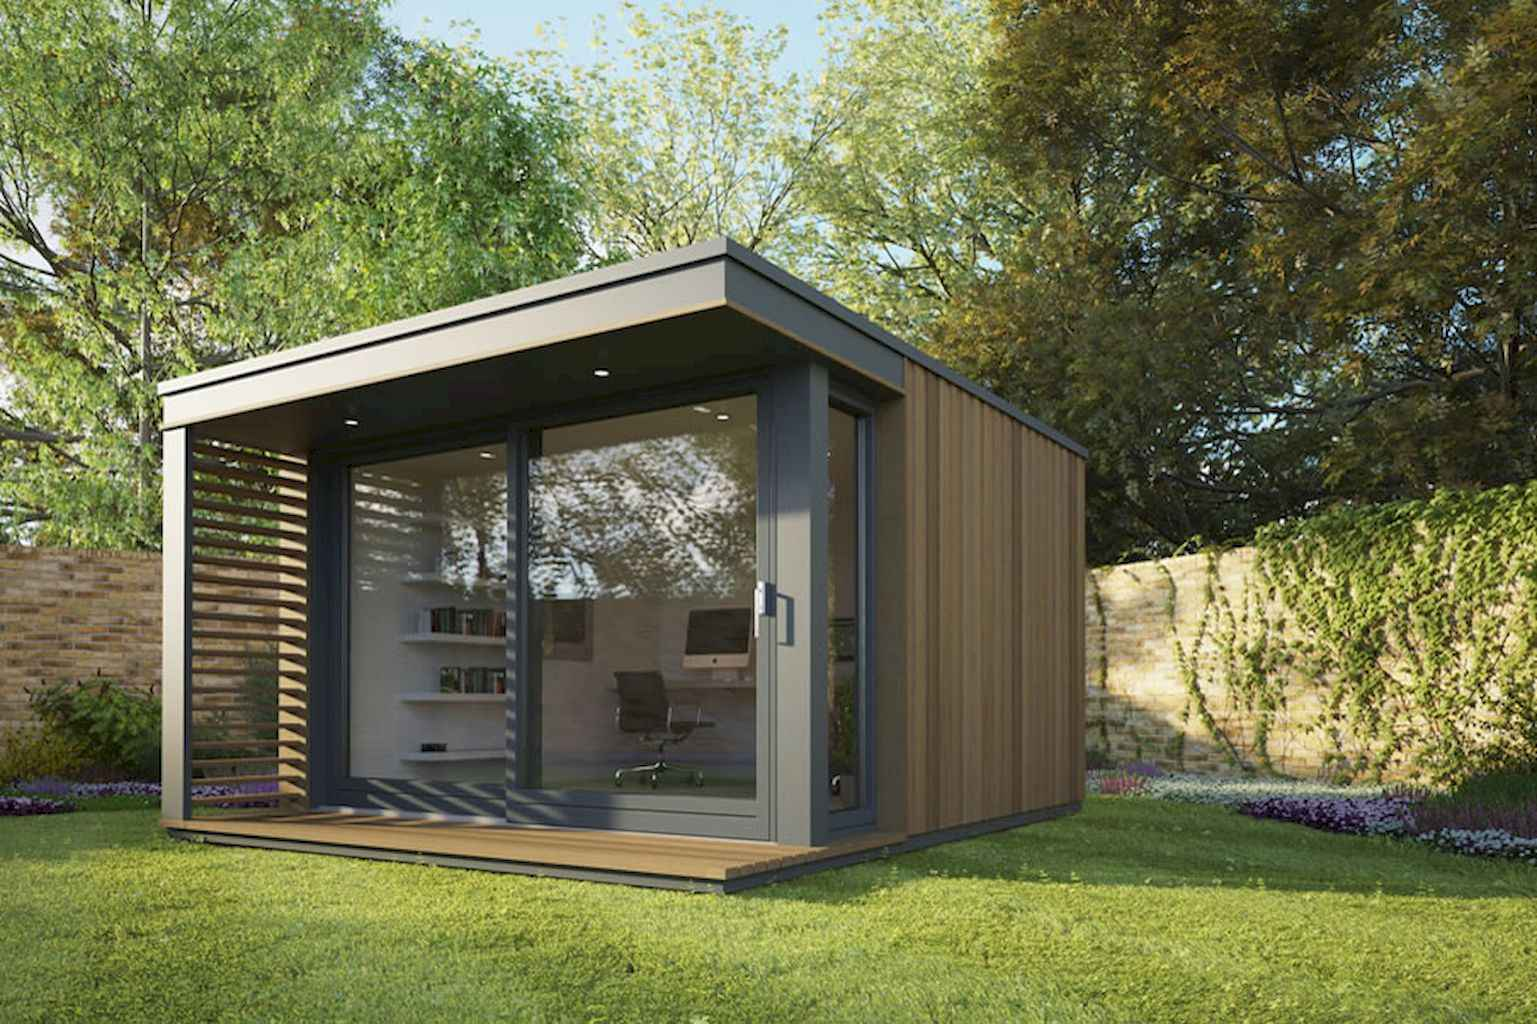 Cool diy backyard studio shed remodel design & decor ideas (20)